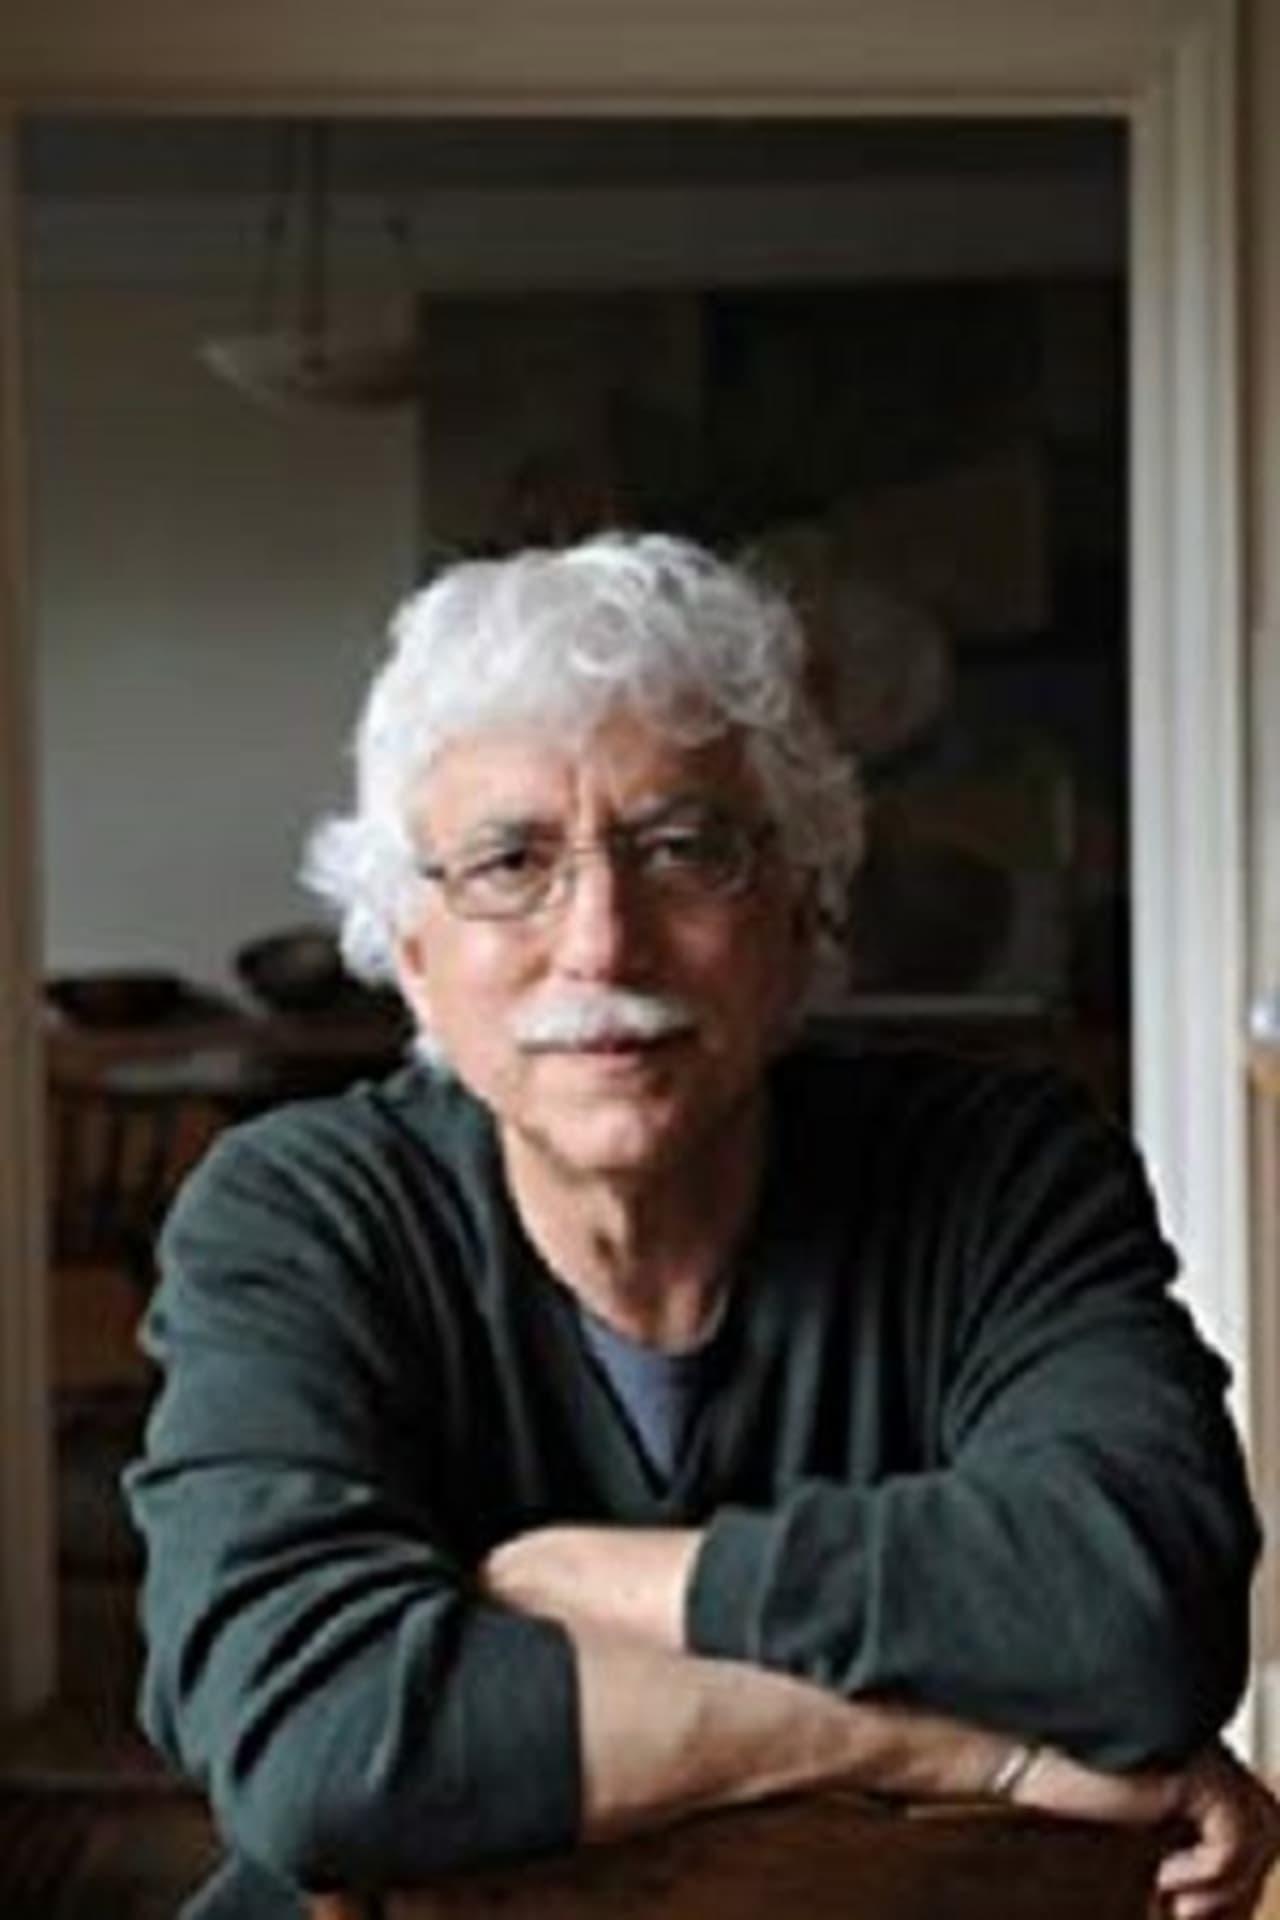 Tom Hurwitz